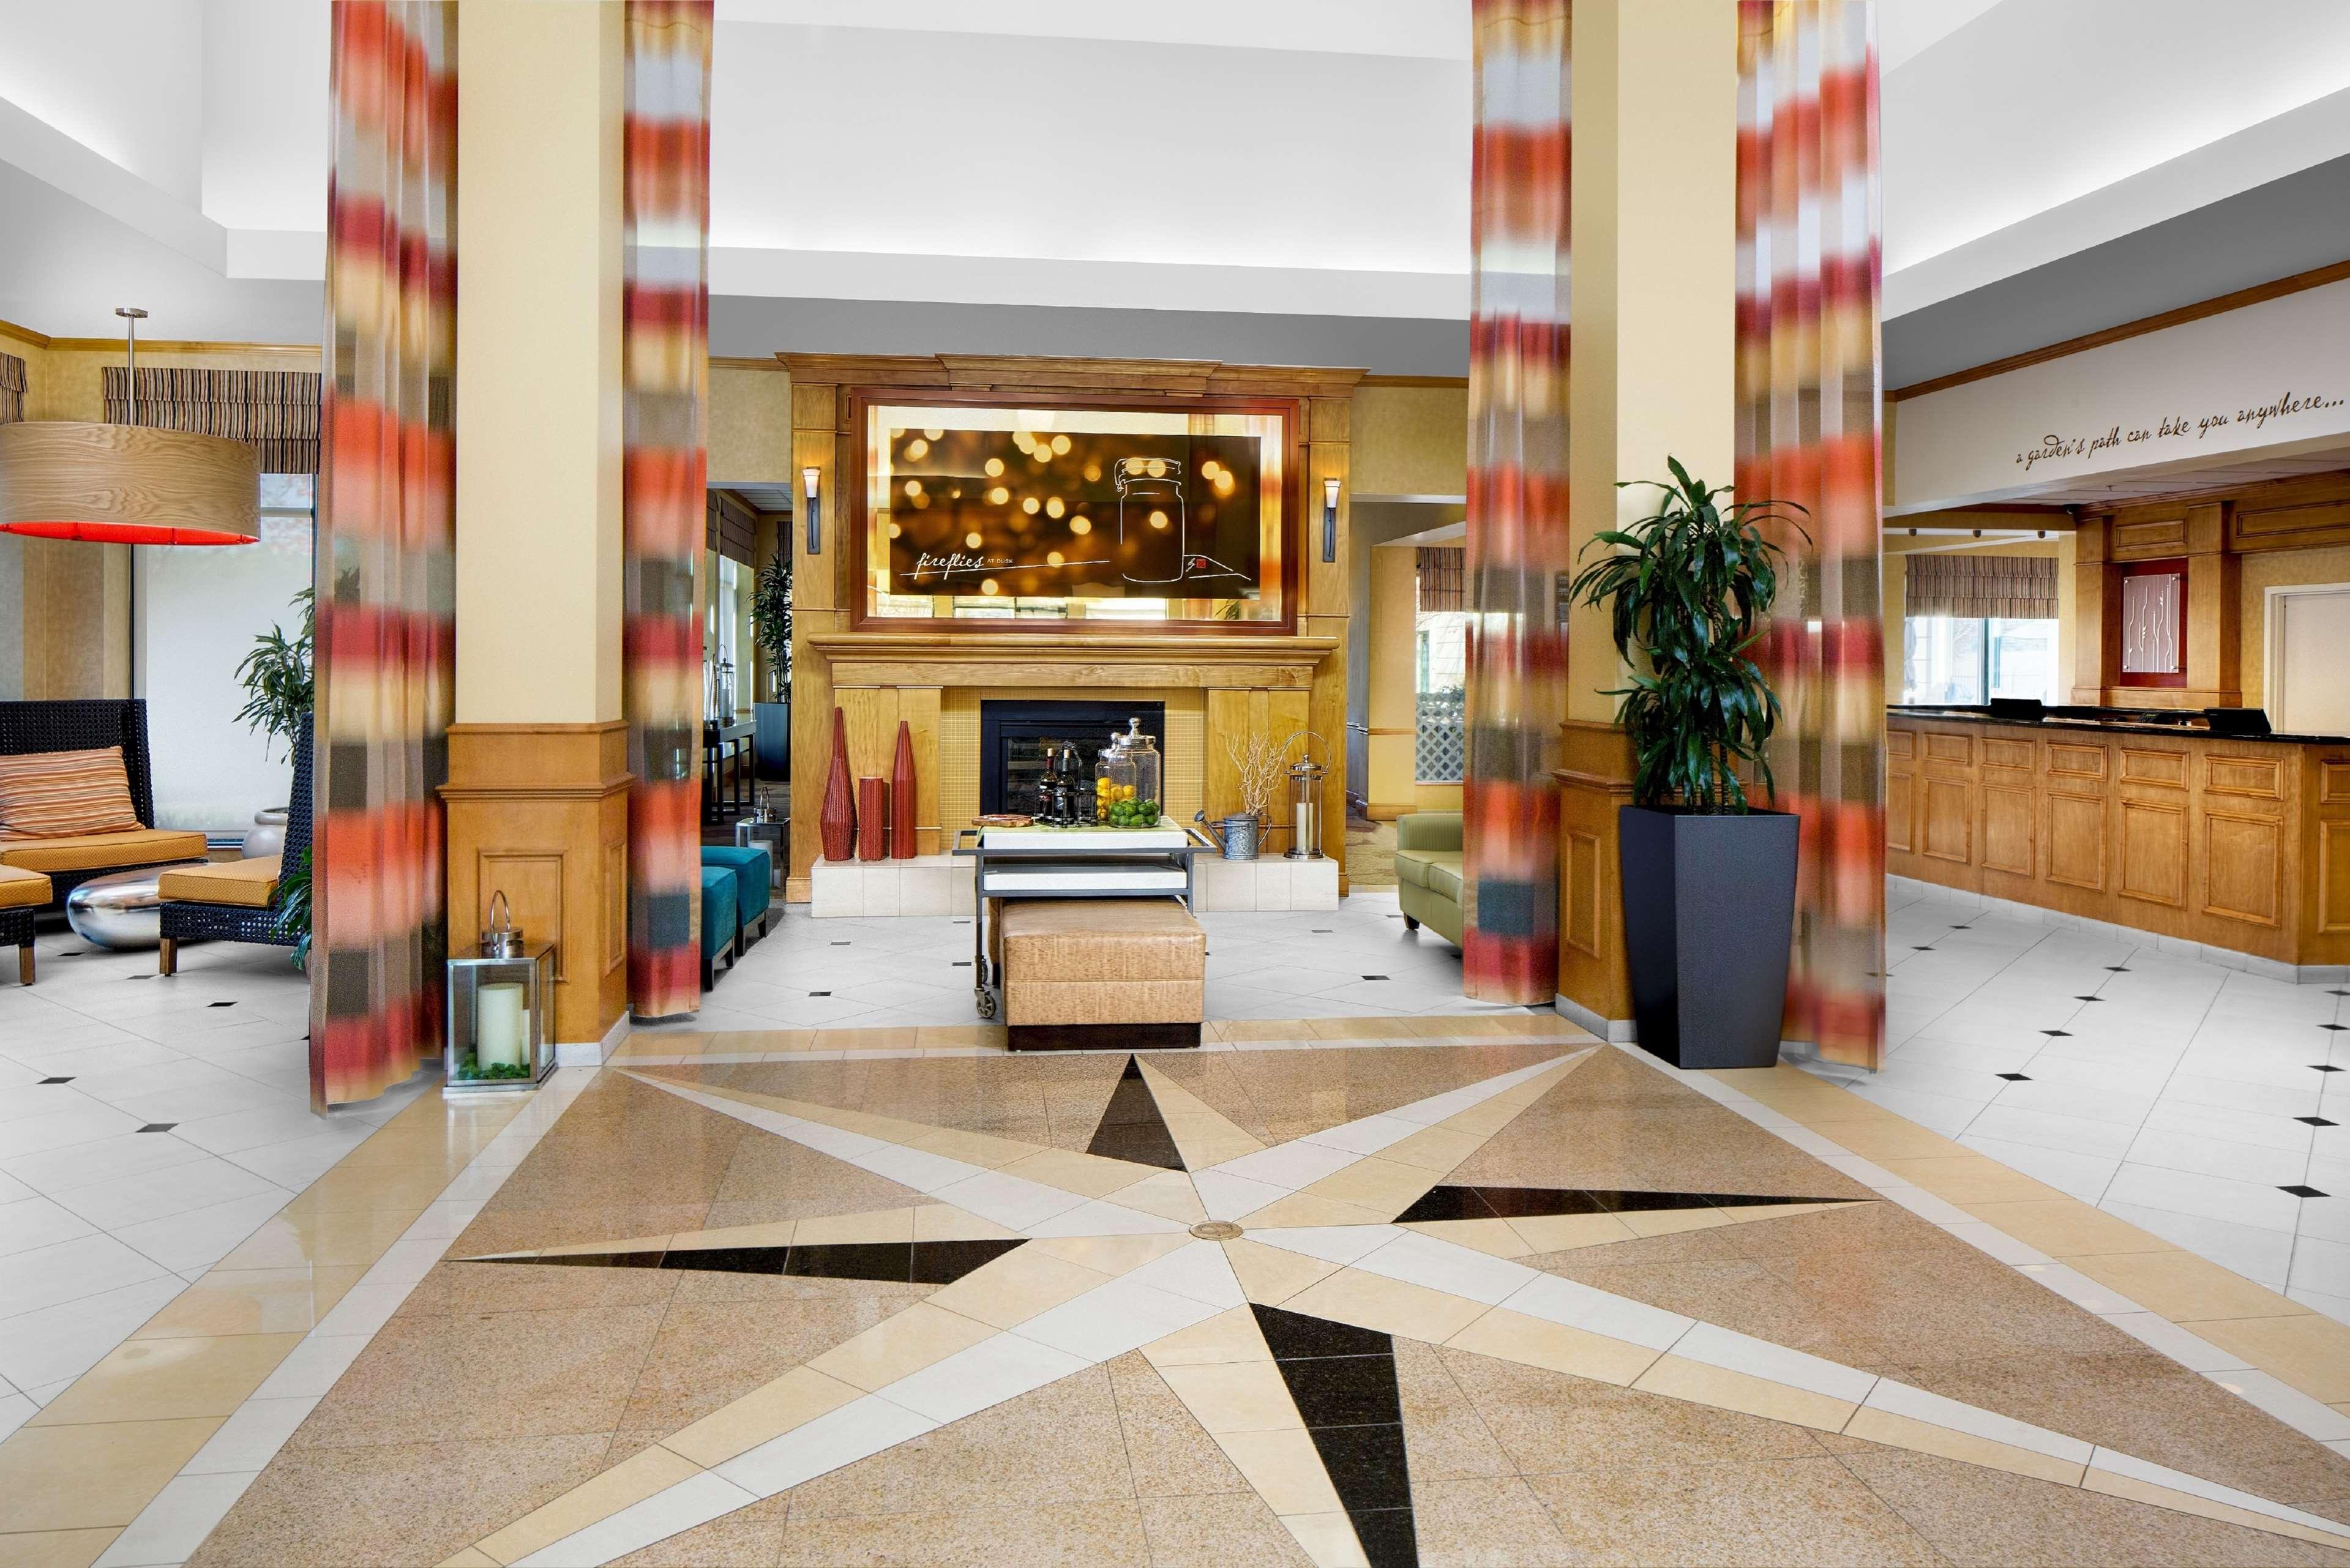 Hilton Garden Inn Atlanta Airport/Millenium Center image 5